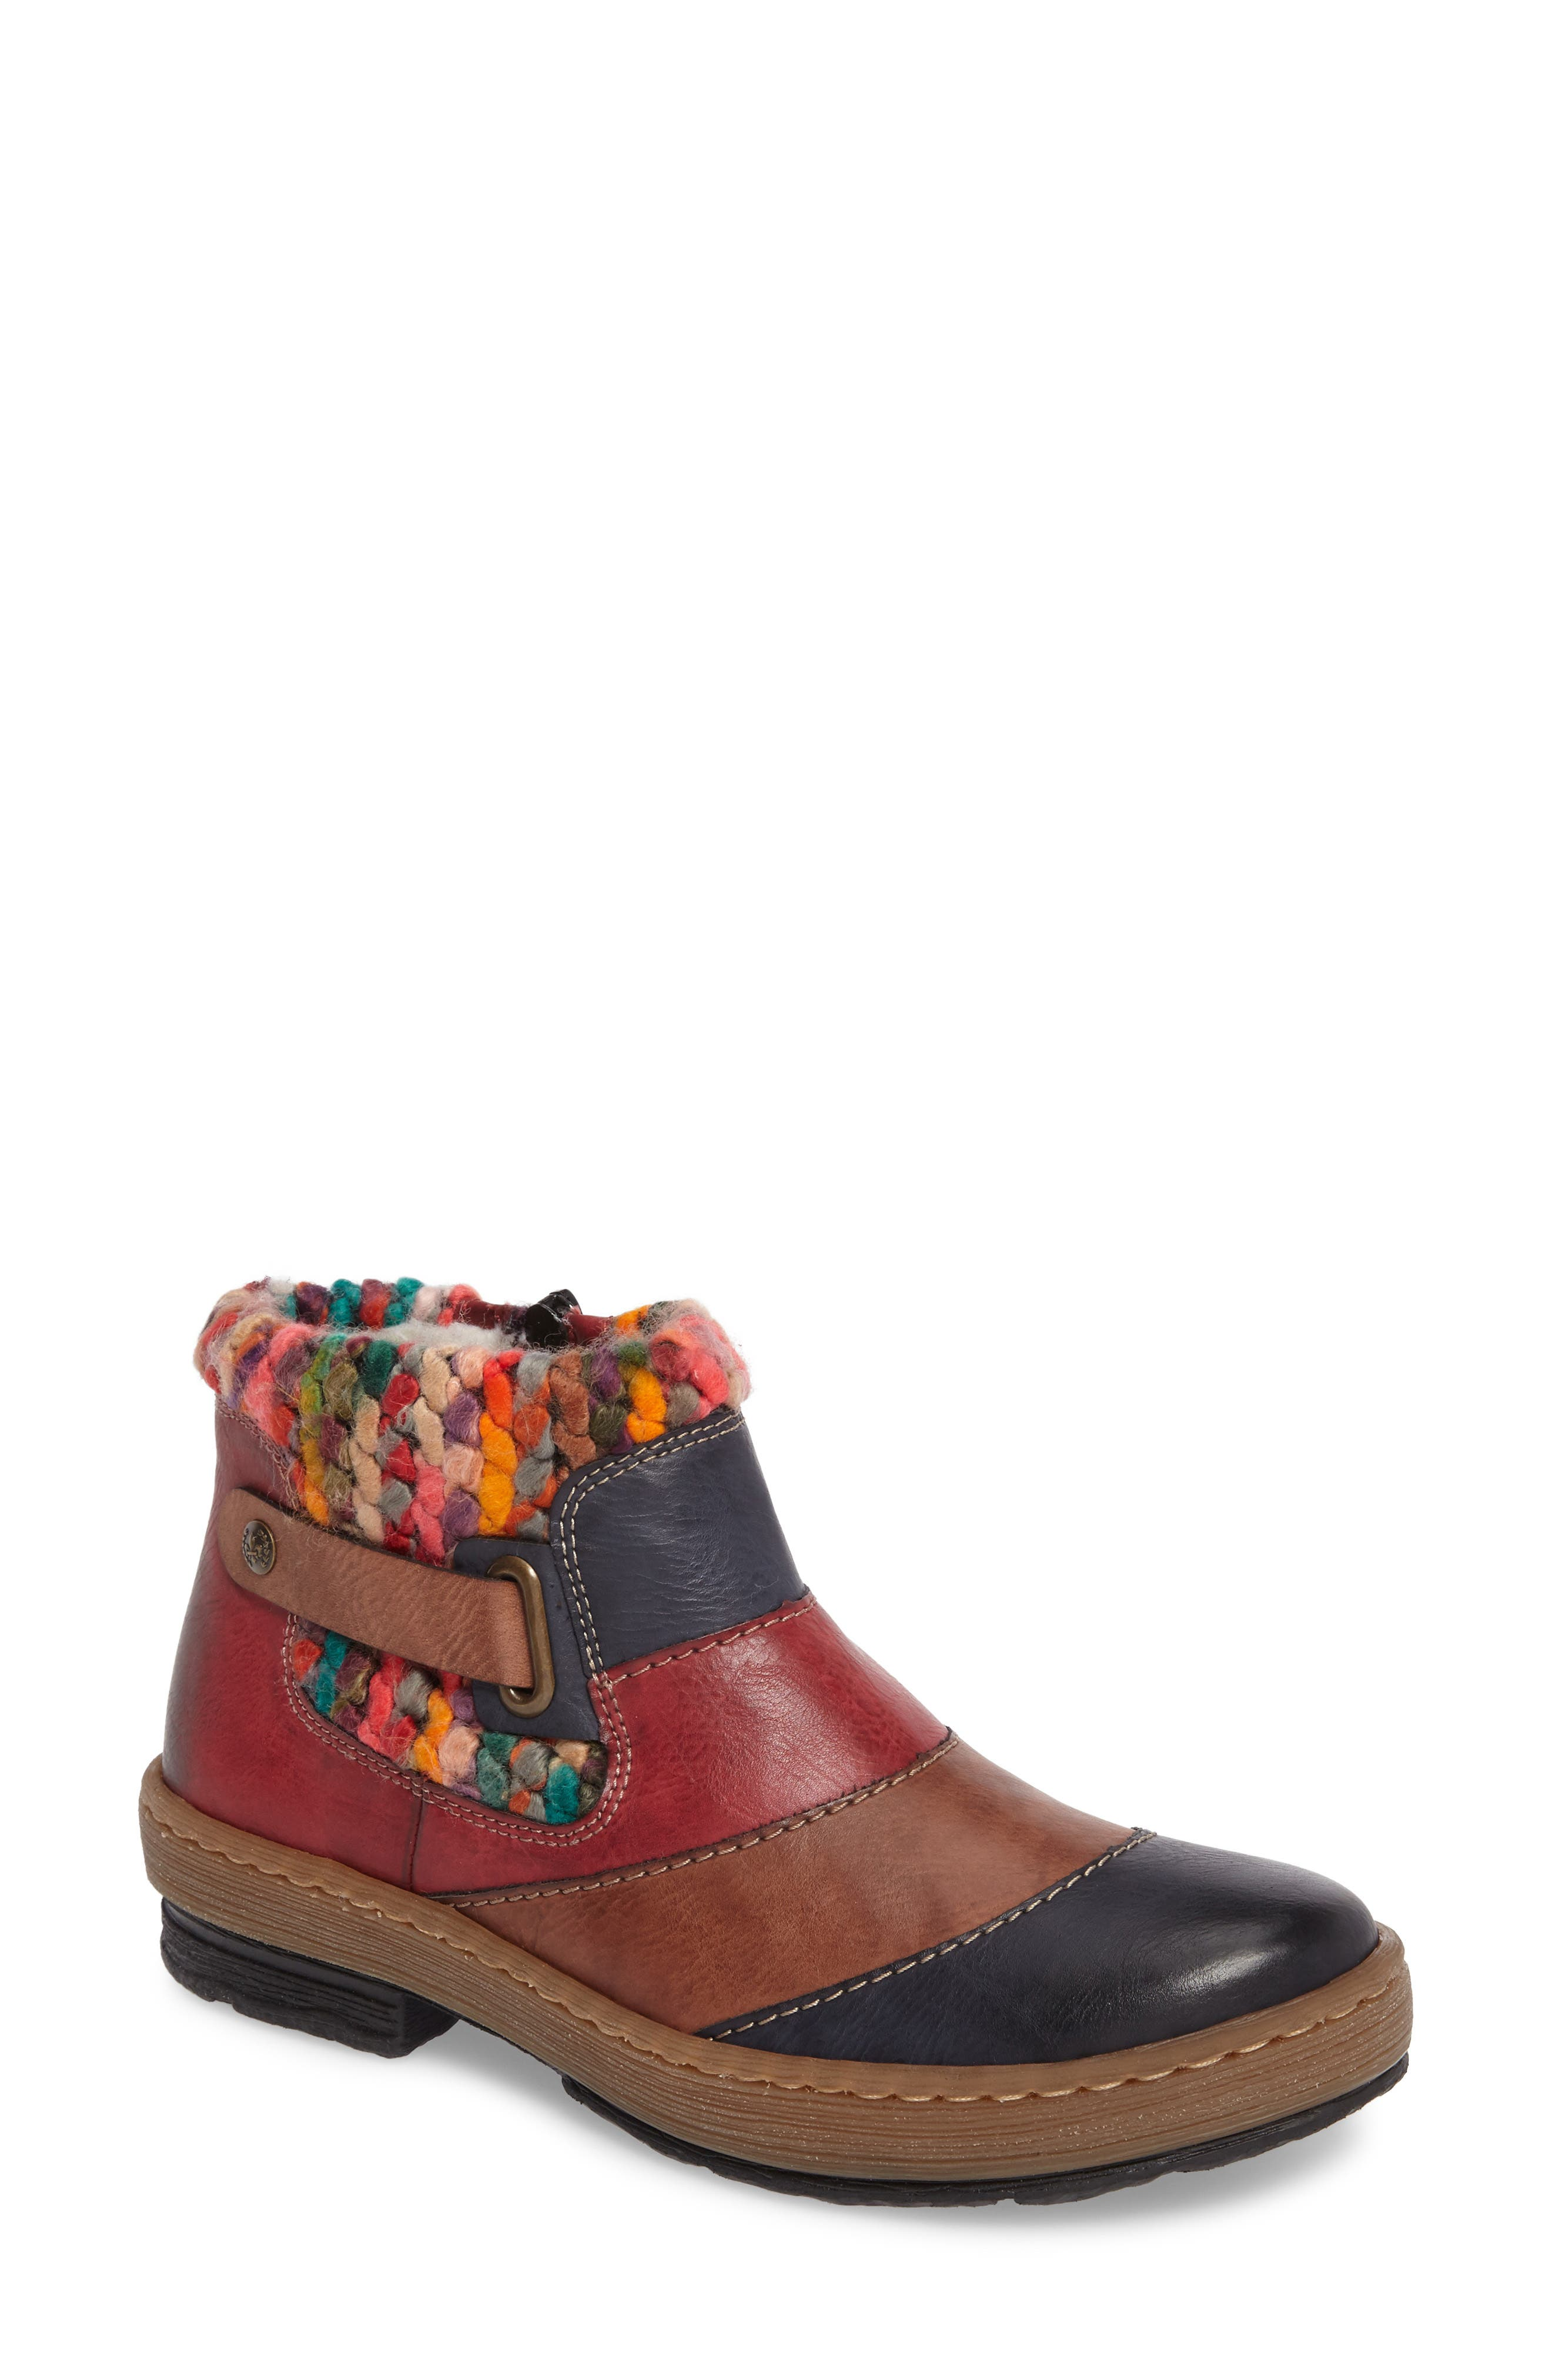 Felicitas 82 Boot,                             Main thumbnail 1, color,                             Ocean Multi Faux Leather